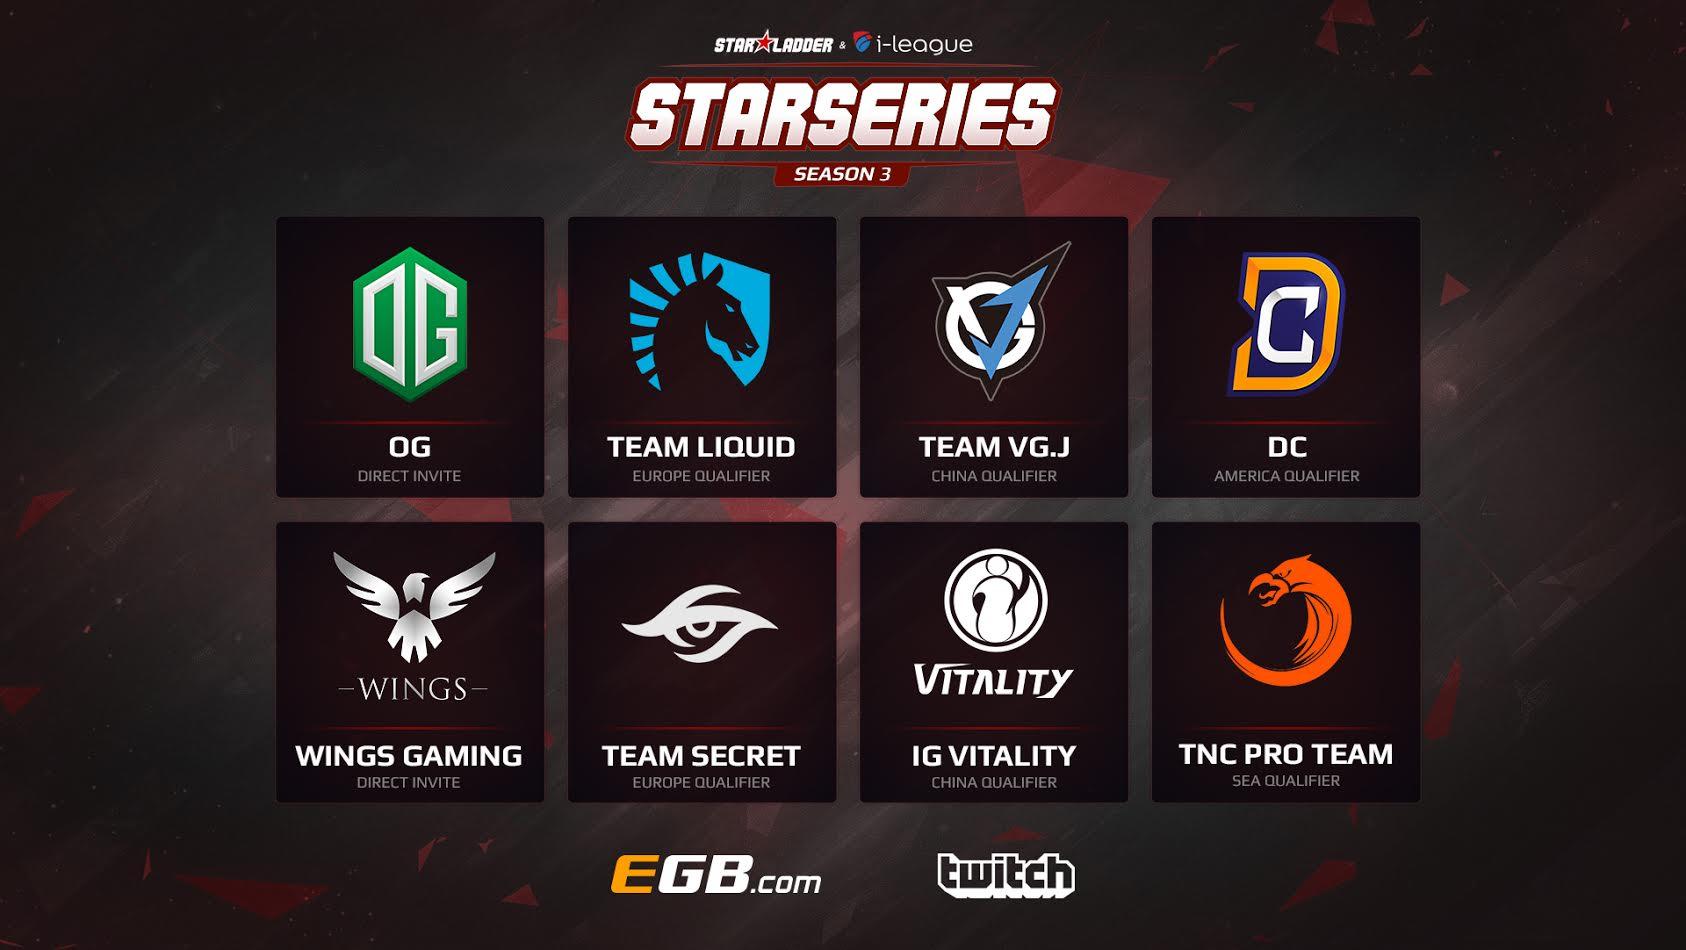 Dota 2 LAN-finals participants at SL i-League StarSeries Season 3